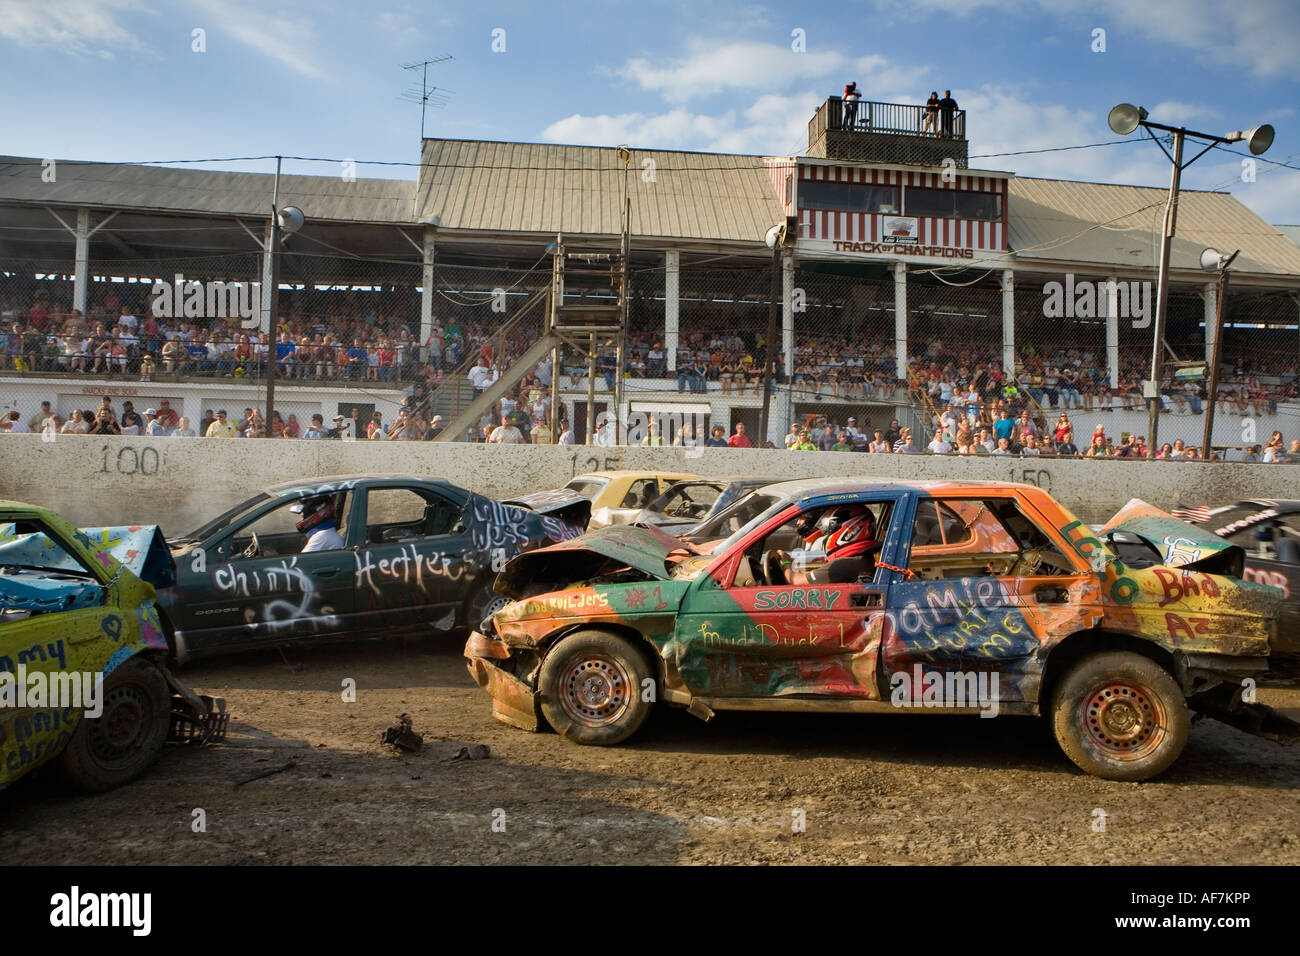 New york montgomery county fonda - Demolition Derby Fonda Fair 2007 Montgomery County New York